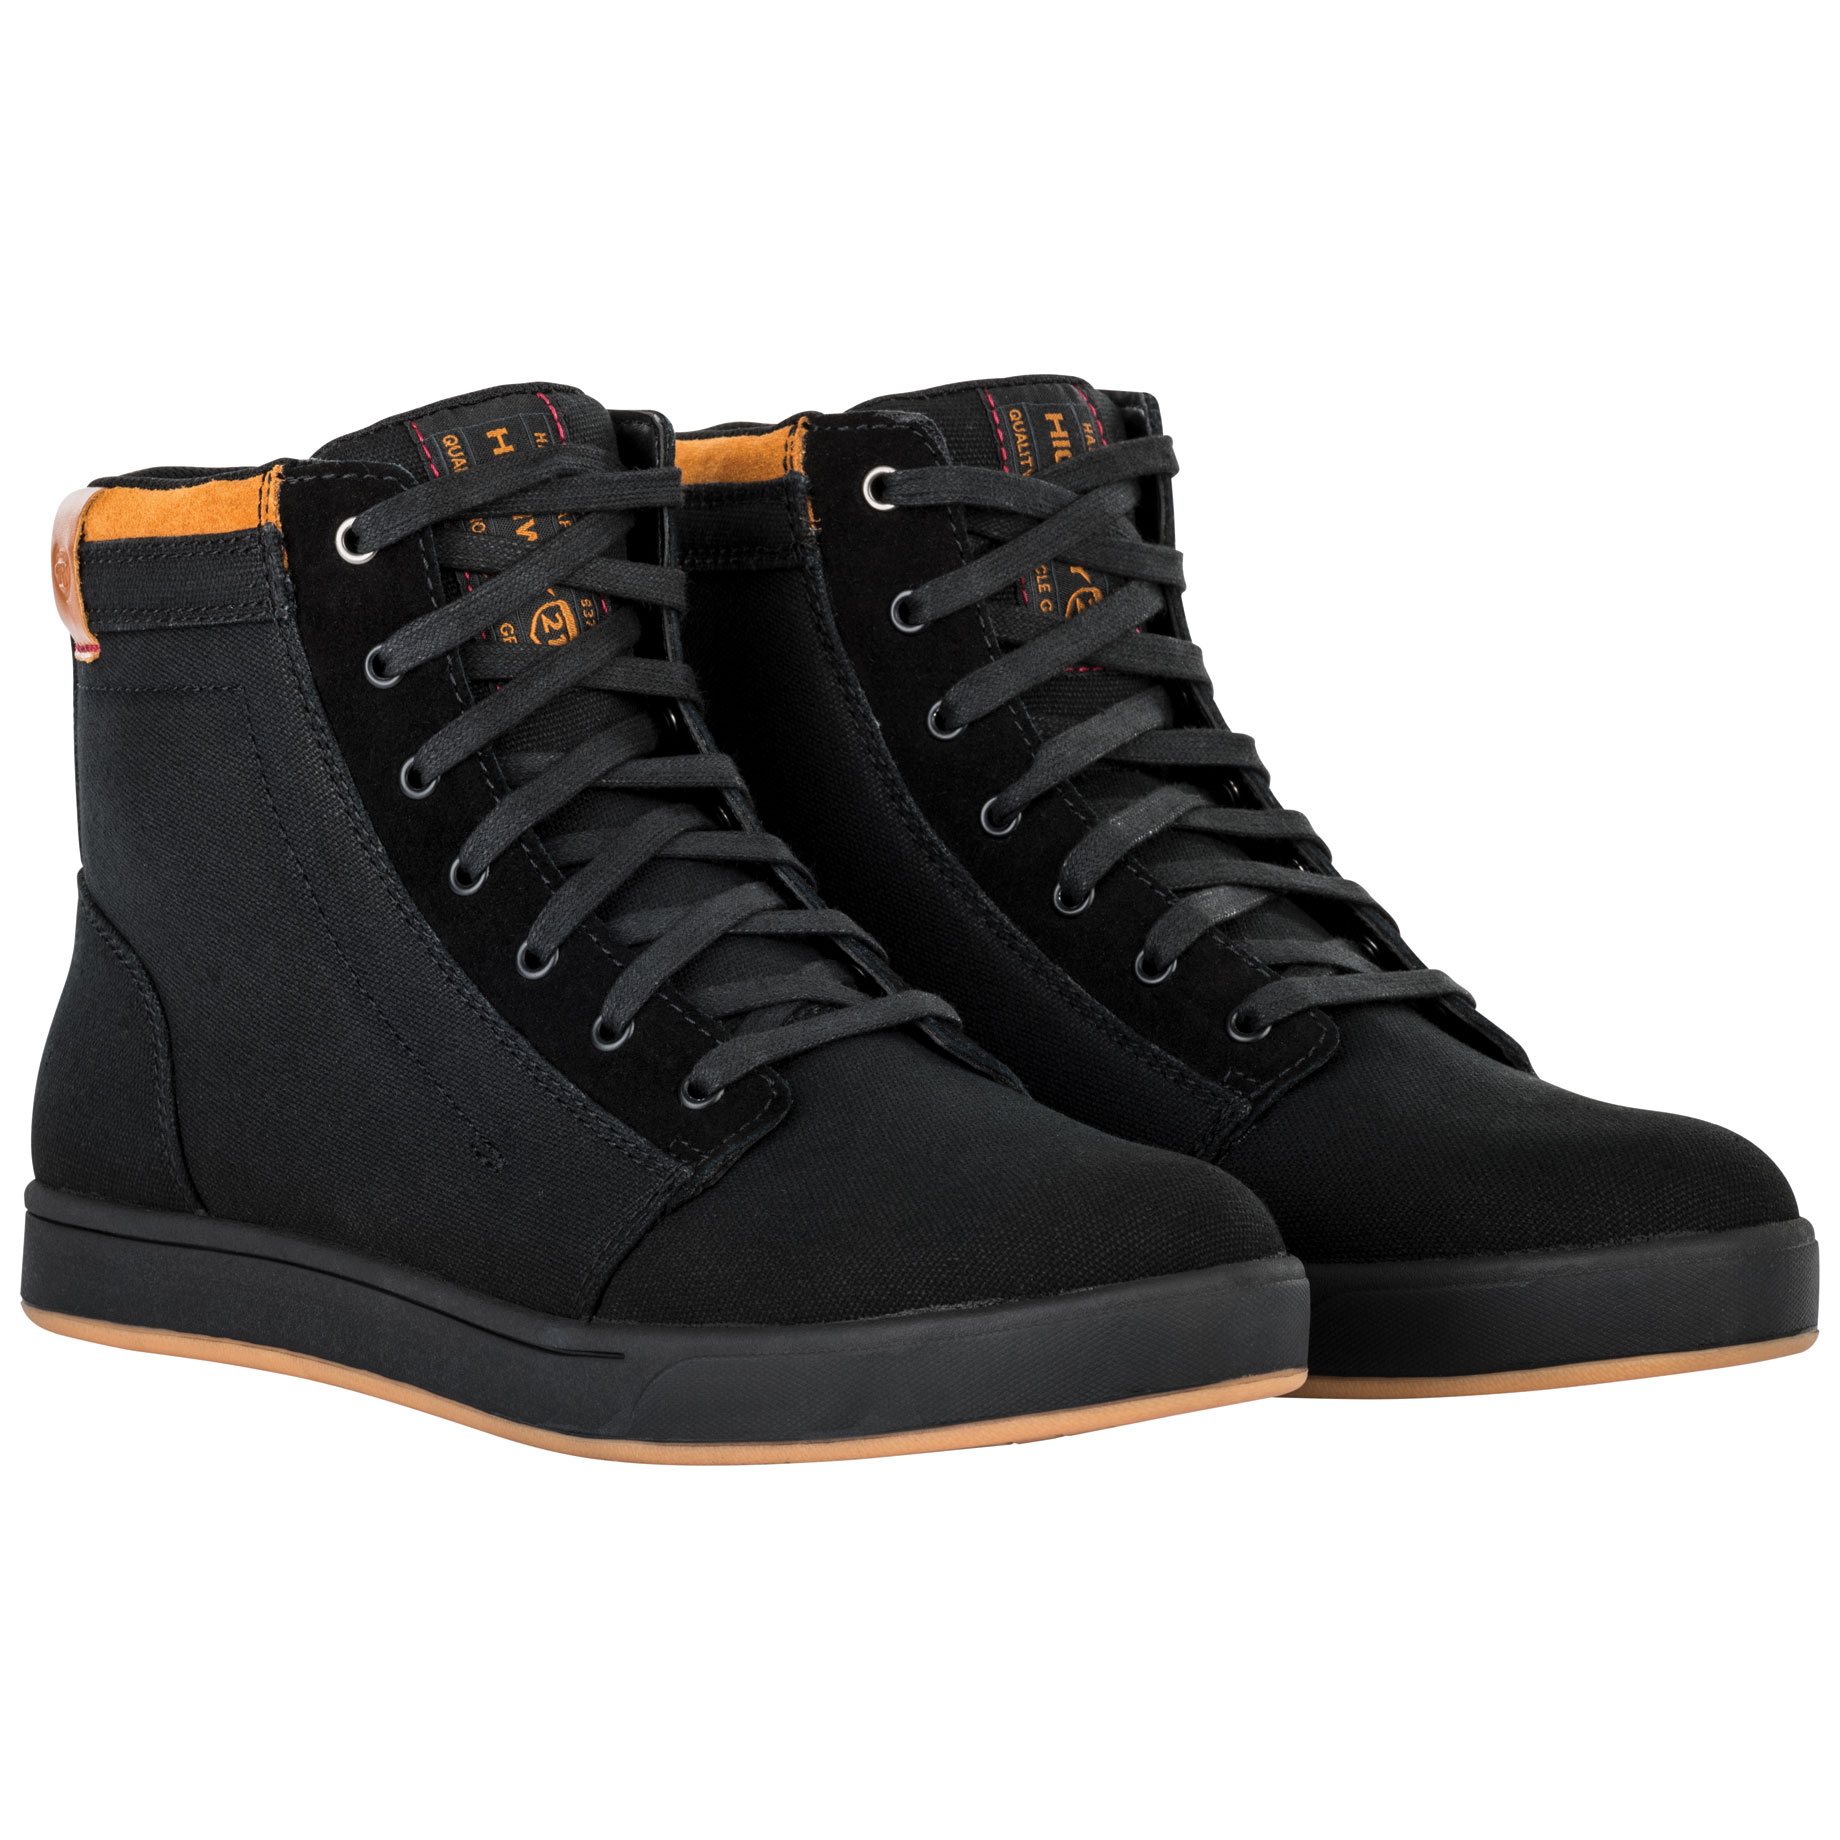 Highway 21 Men's Axle Black Riding Shoes